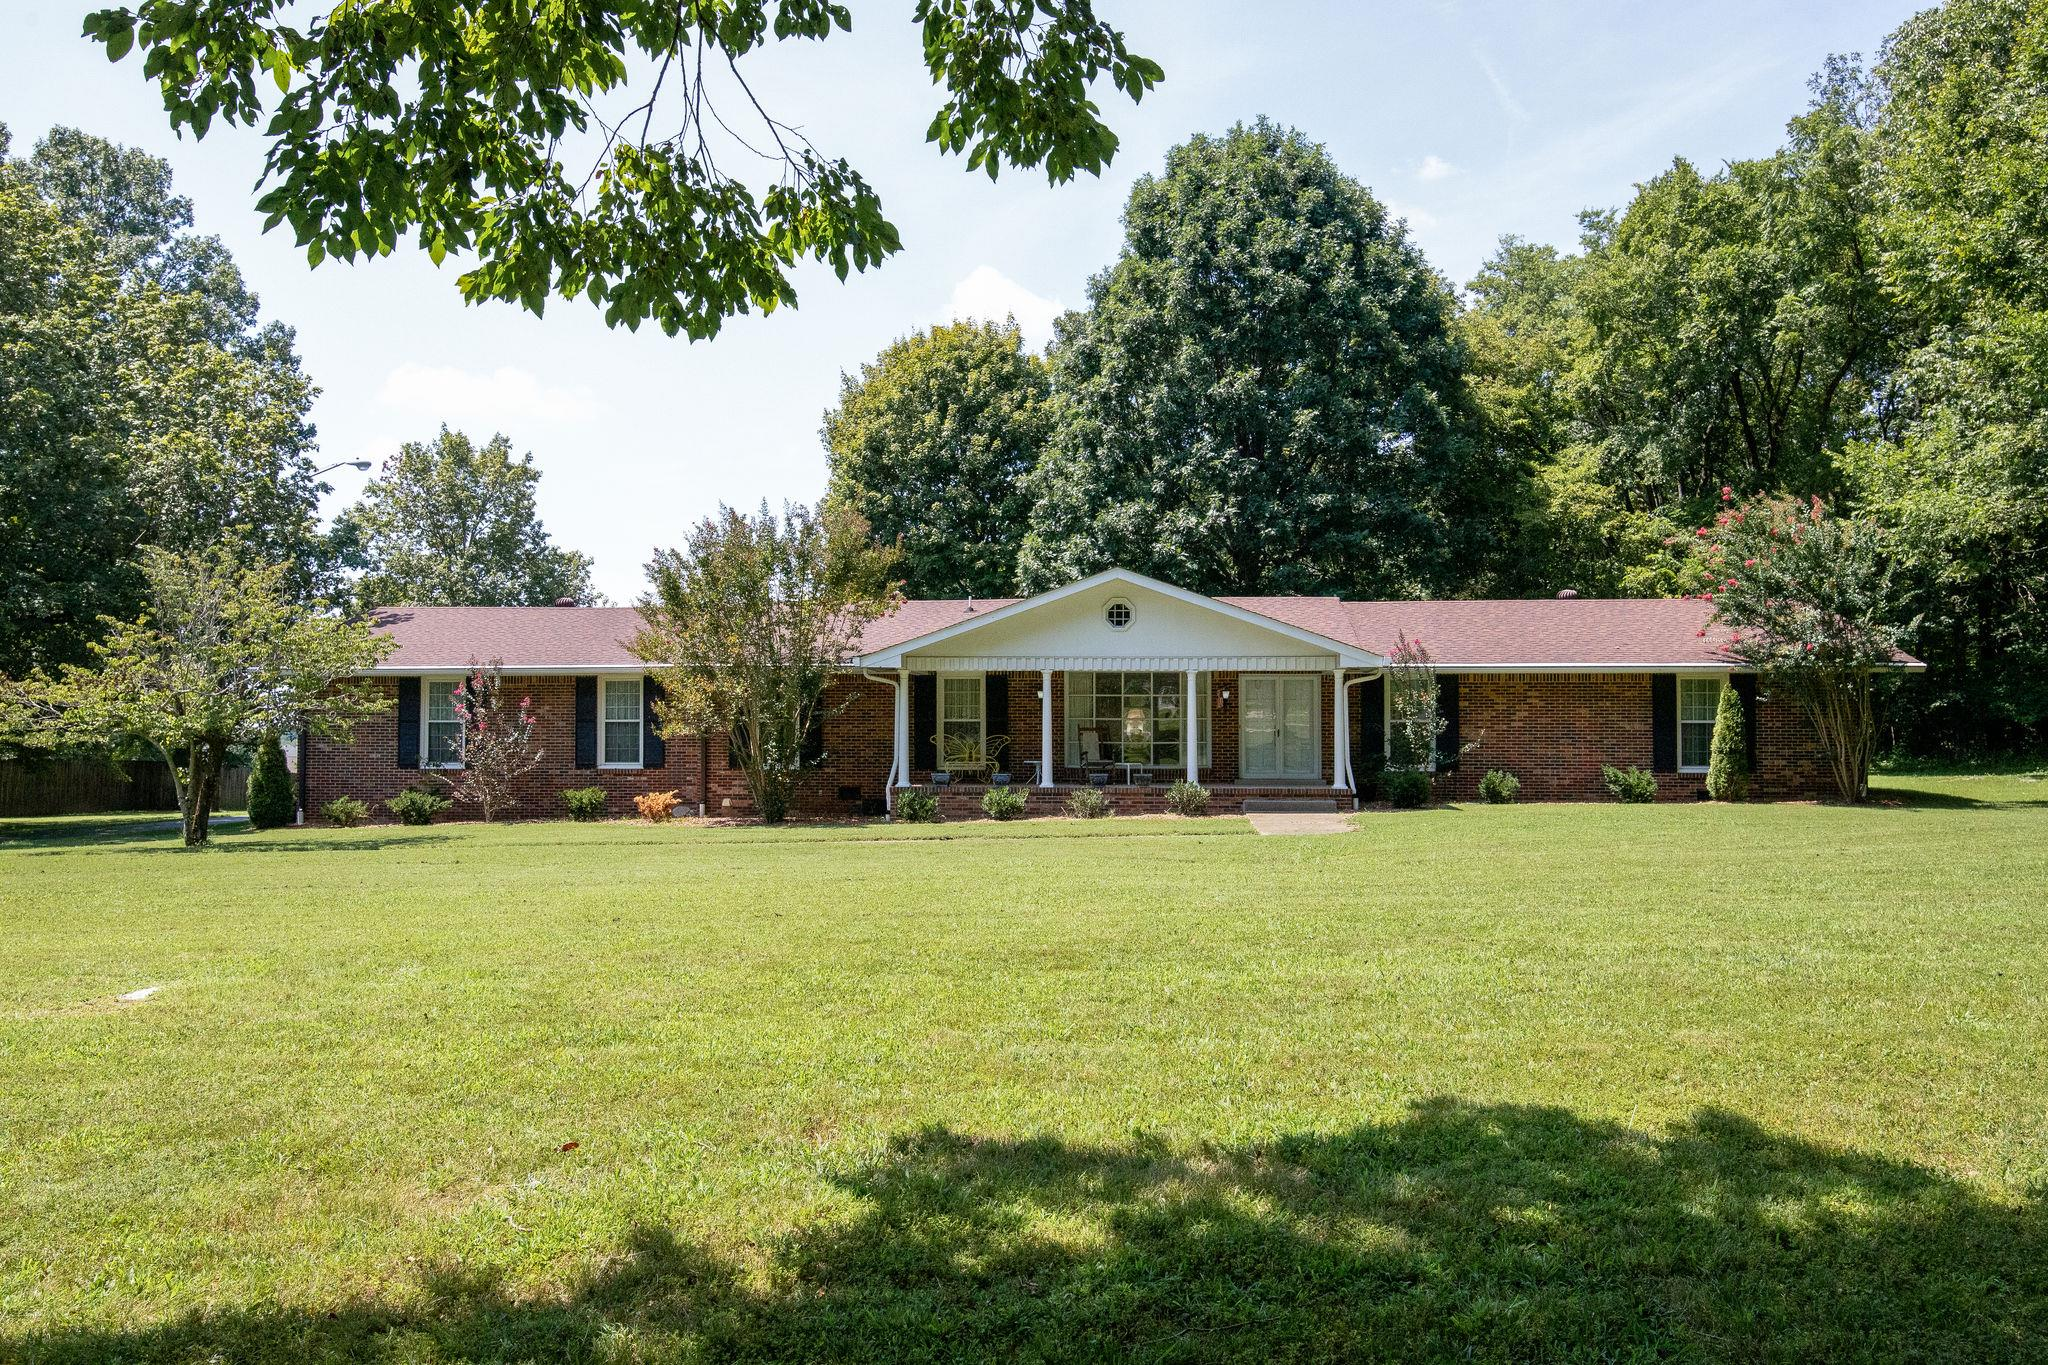 3208 Earhart Rd, Hermitage, TN 37076 - Hermitage, TN real estate listing